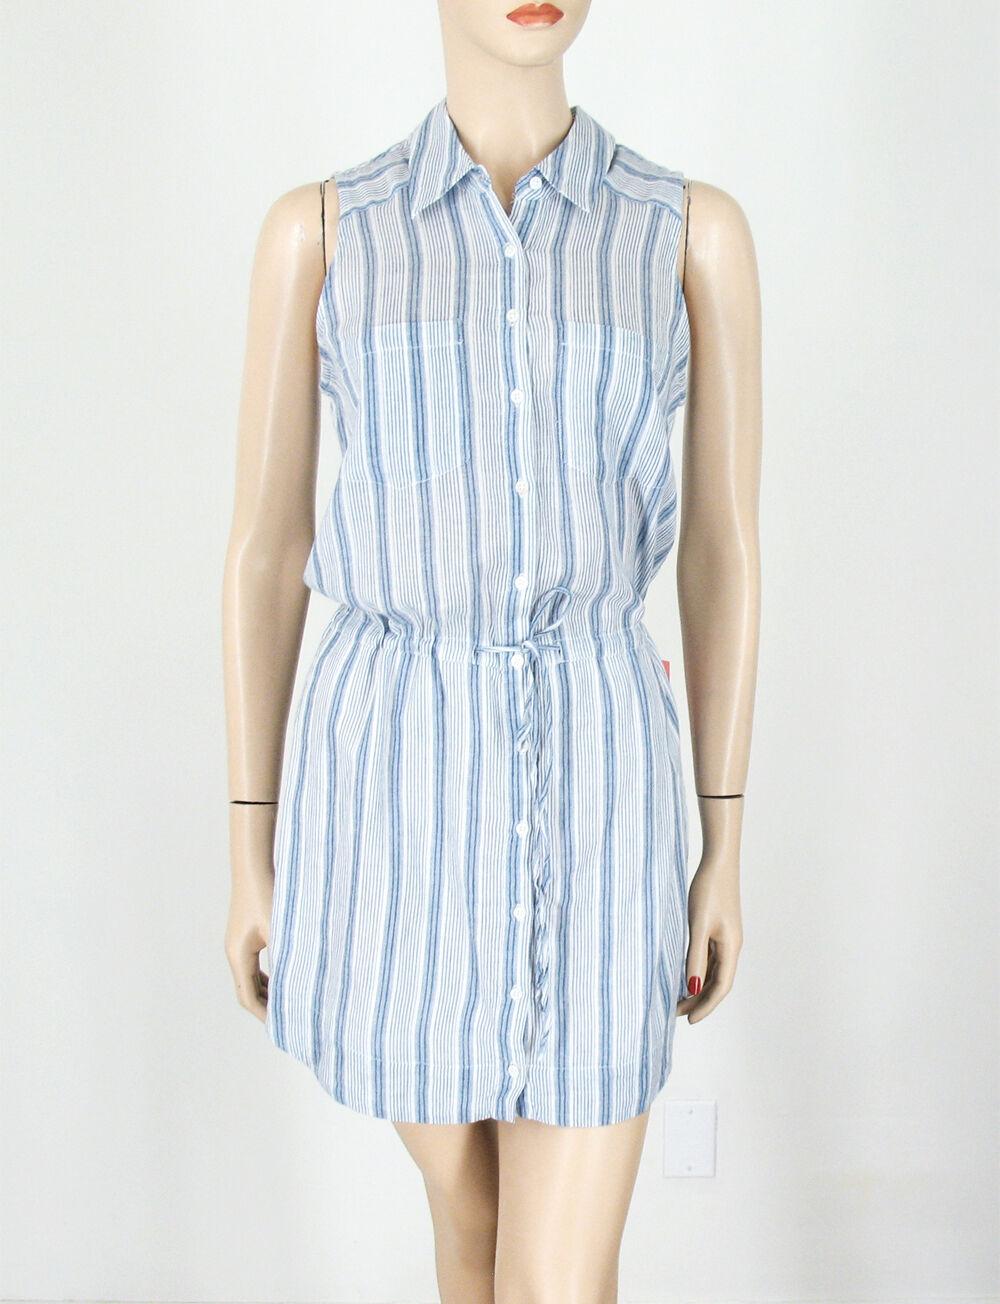 Paige Denim Yvonne Striped Shirt Dress Cotton Blau Weiß XS  9664 BM14